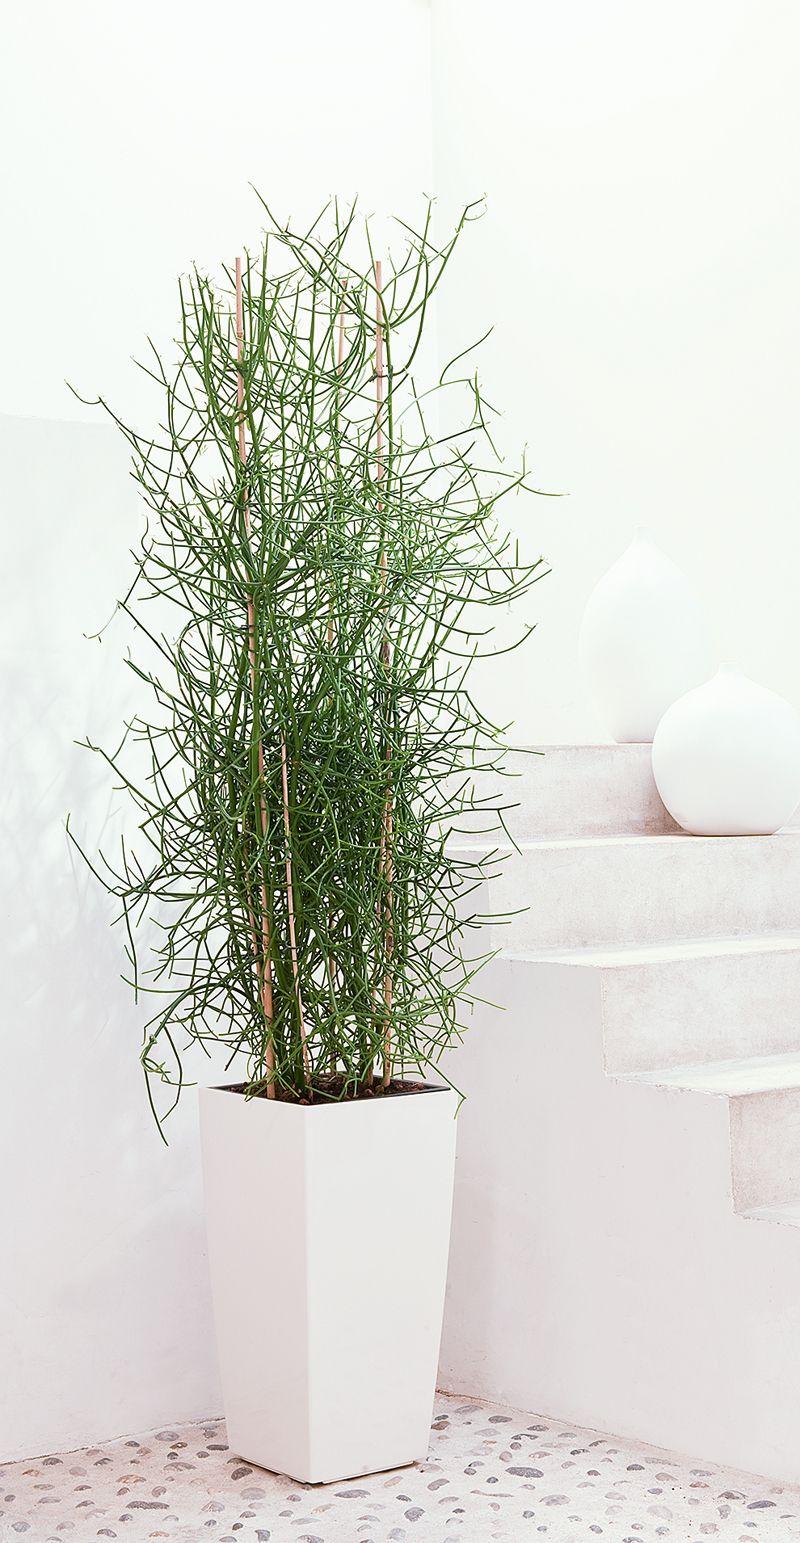 plante verte oxygene